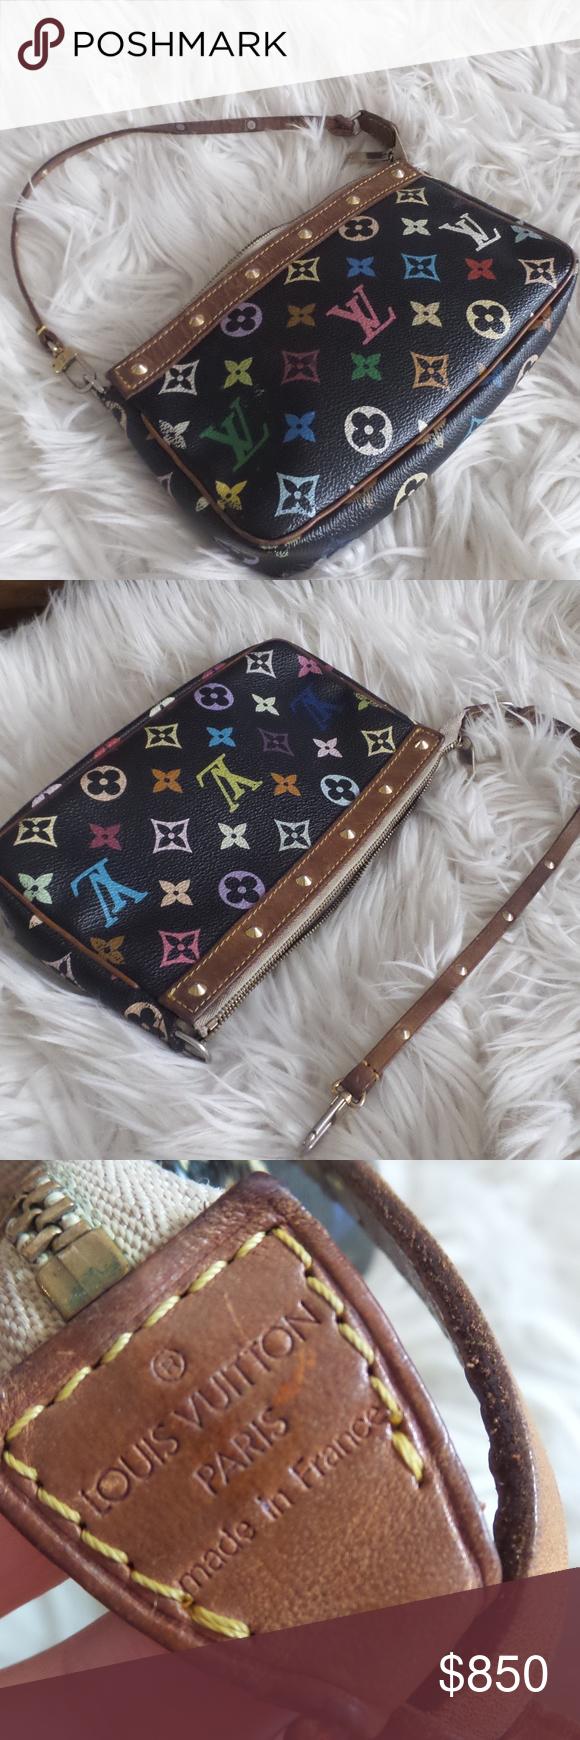 Lv Multicolored Pochette Handbag Vintage Purse Louis Vuitton Bag Black And Brown